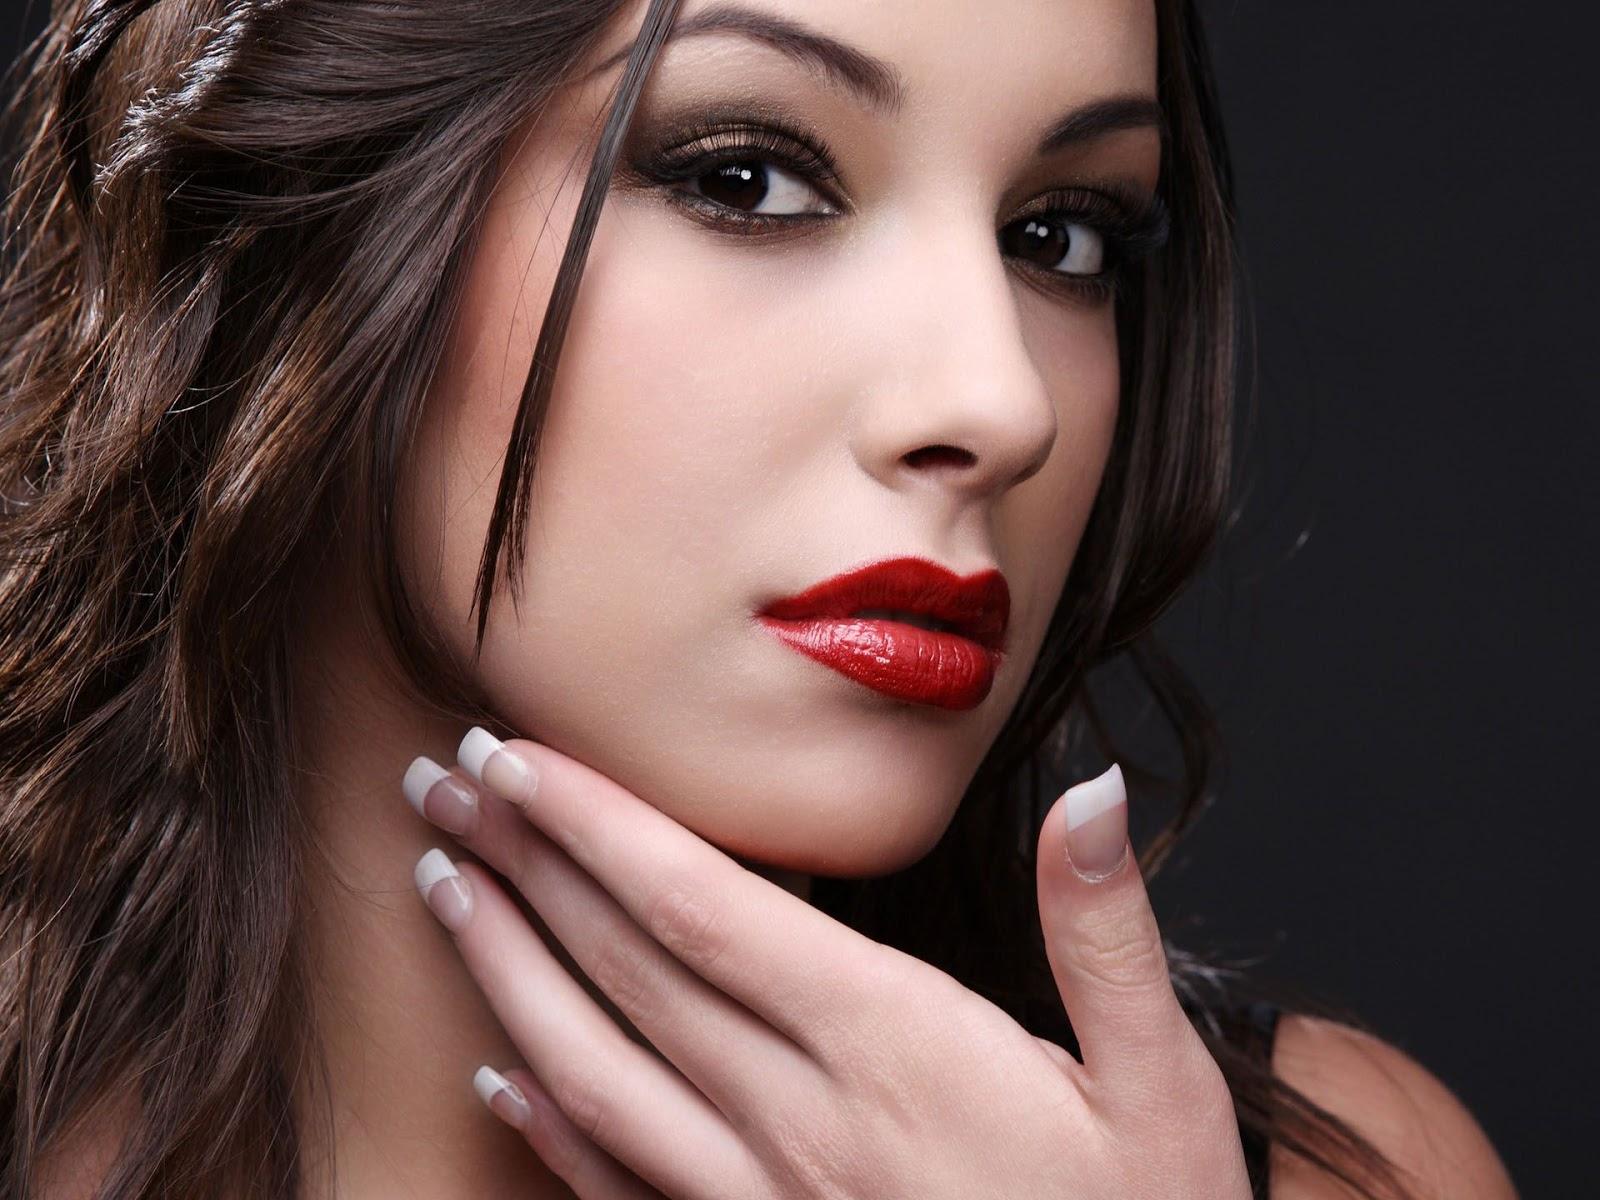 Beautiful Women Faces Wallpaper Wallpapersafari